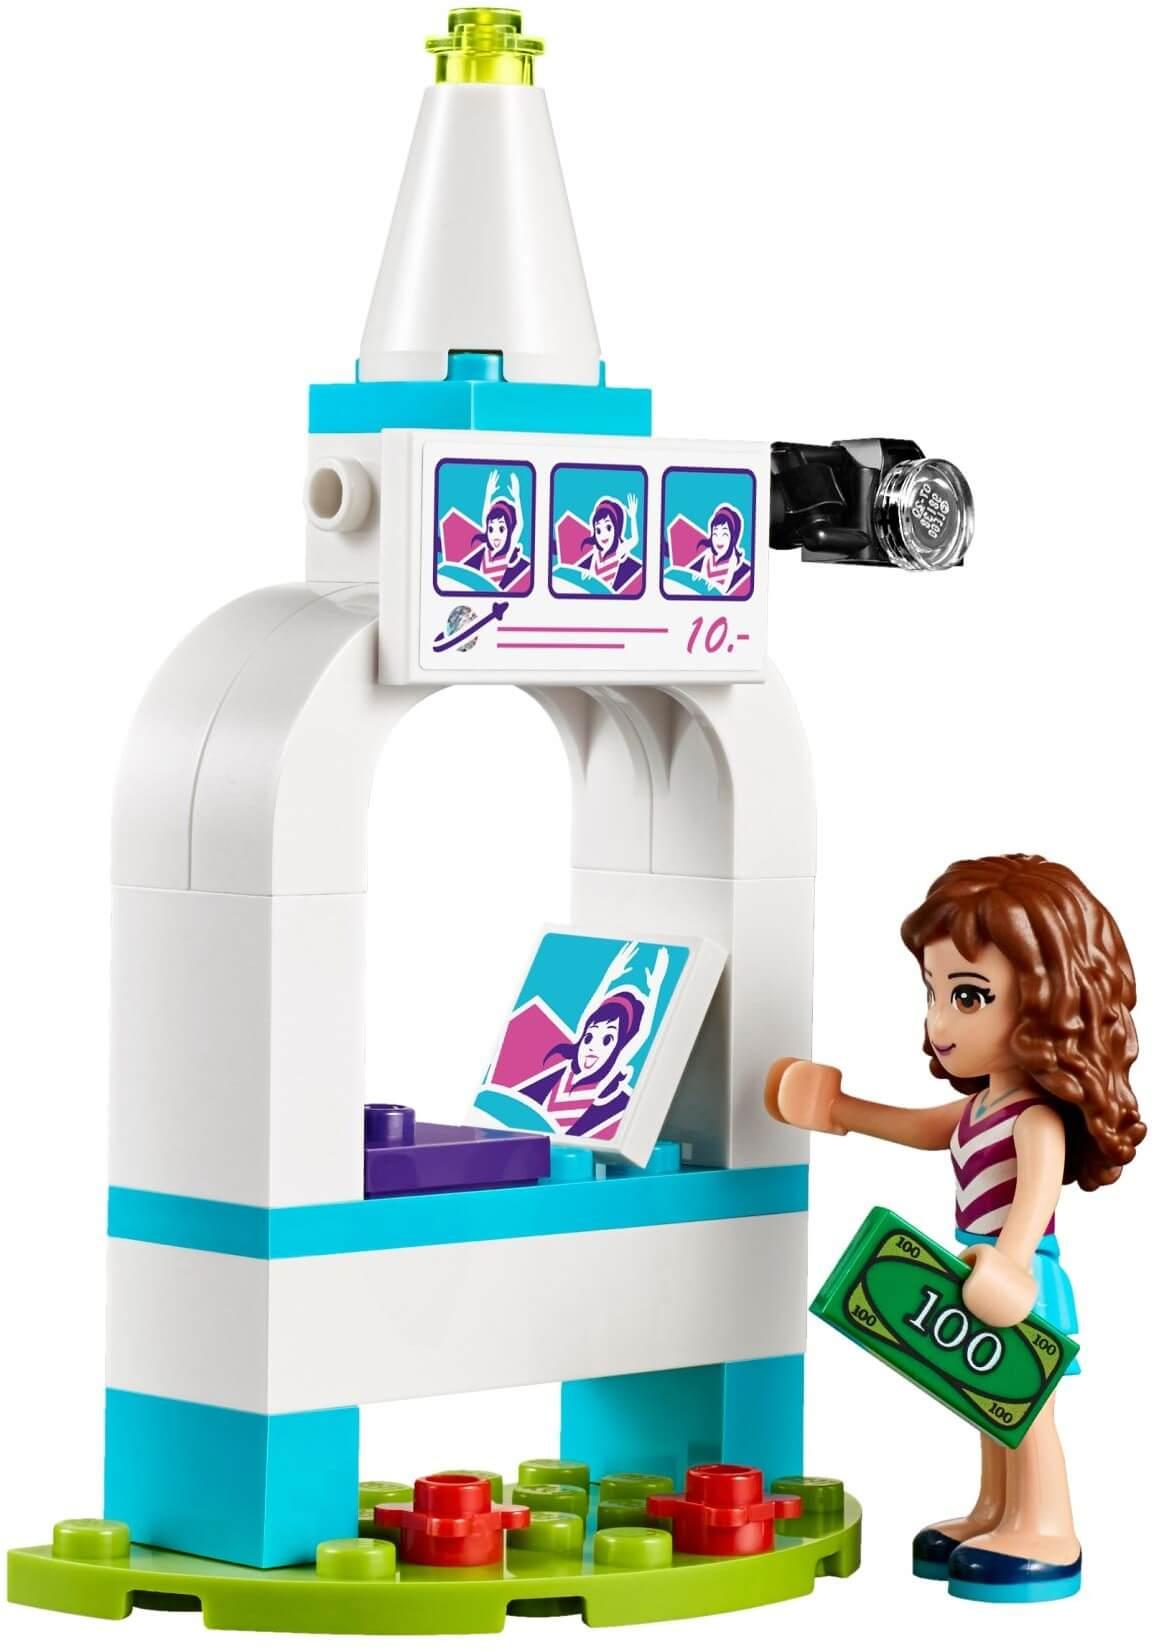 Mua đồ chơi LEGO 41128 - LEGO Friends 41128 - Vòng Đu Quay Giải Trí (LEGO Friends Amusement Park Space Ride 41128)